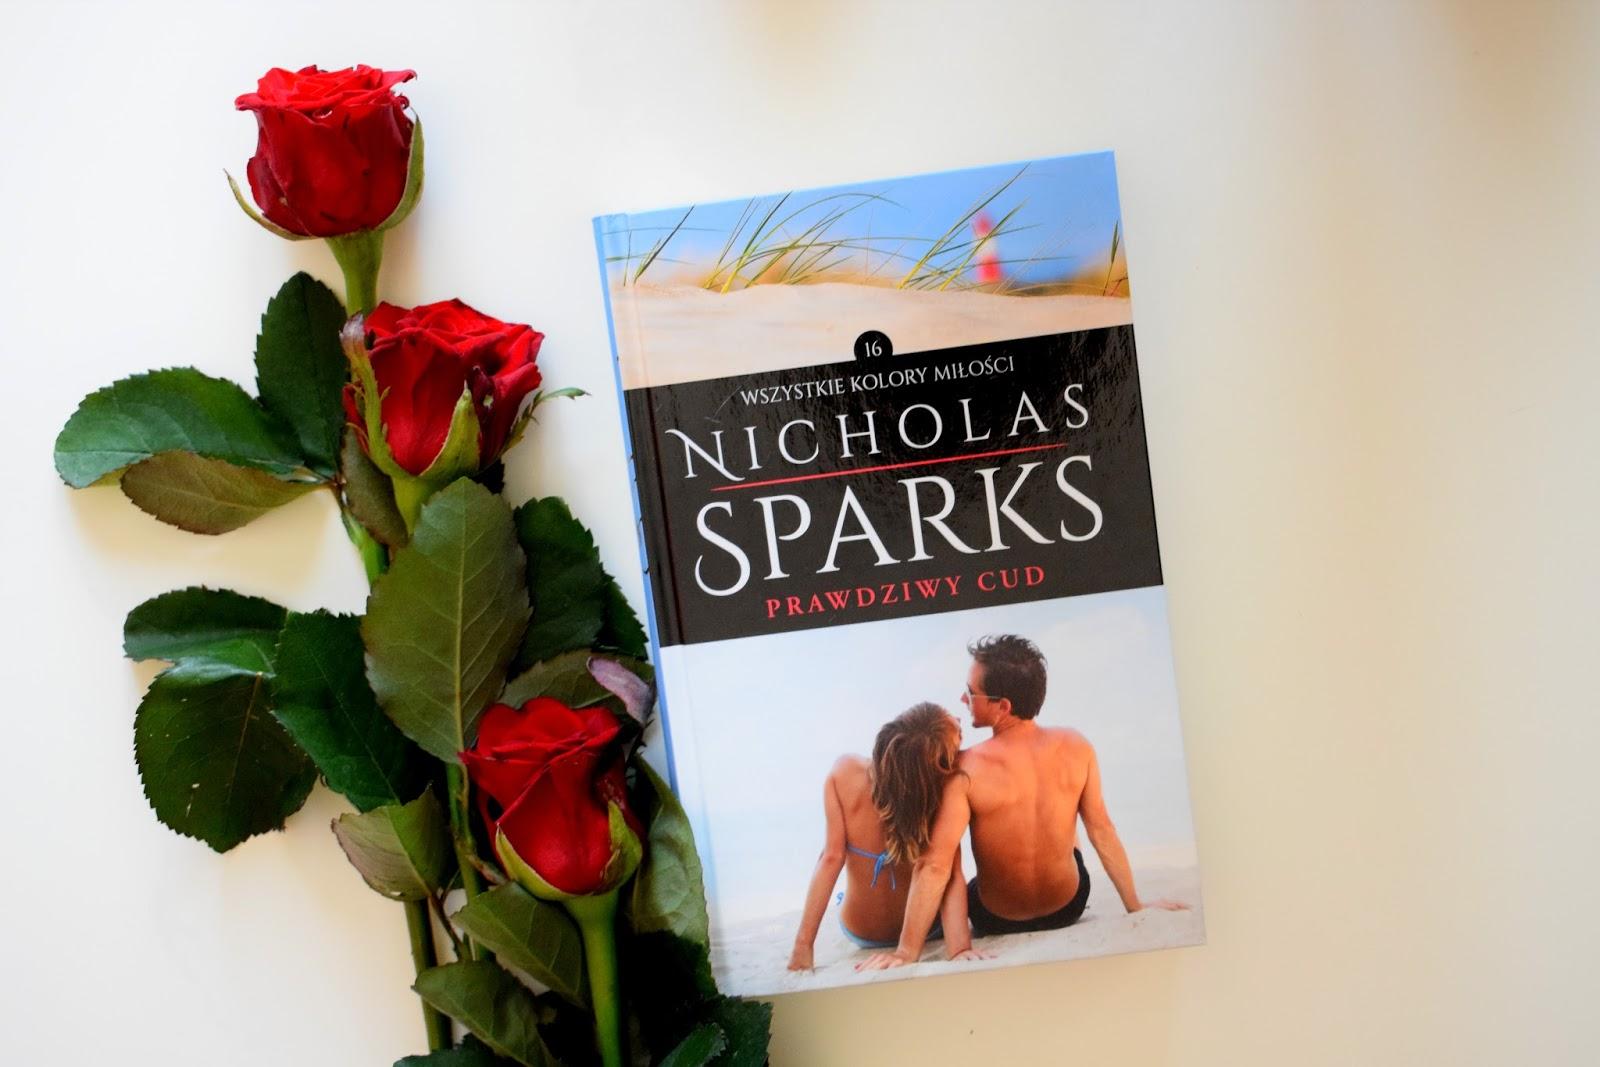 Nicholas Sparks, Prawdziwy cud